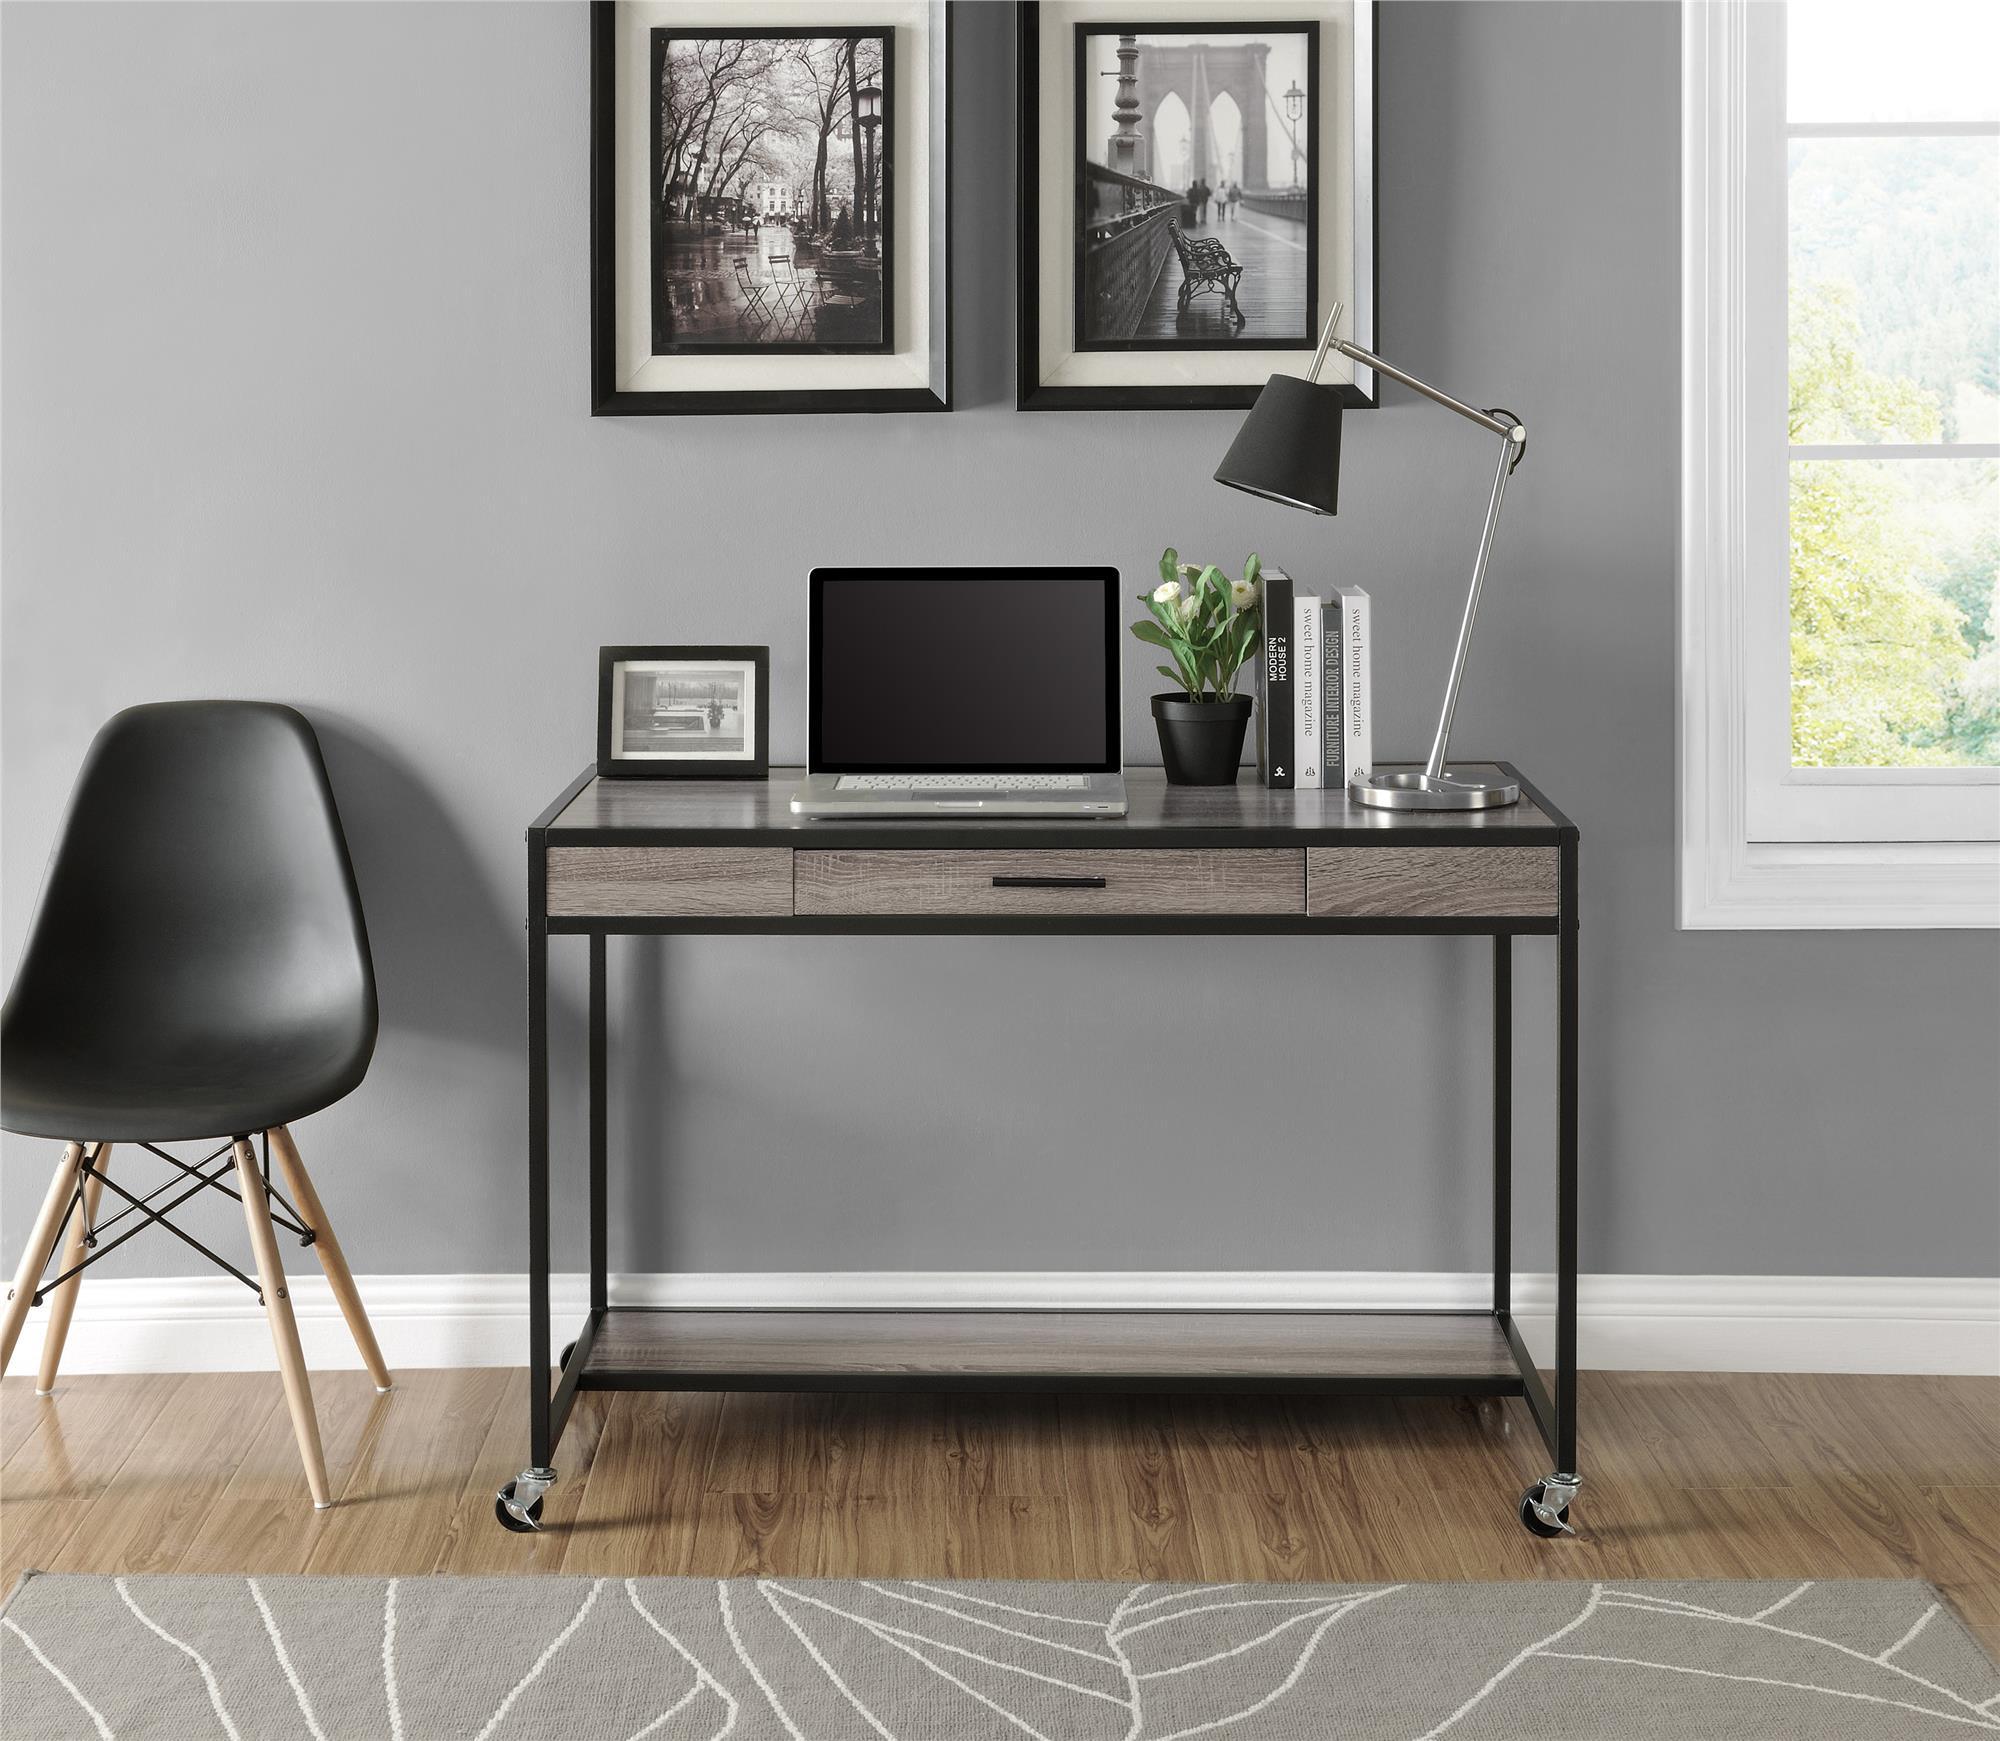 Dorel Home Furnishings Sonoma Oak Mason Ridge Mobile Desk